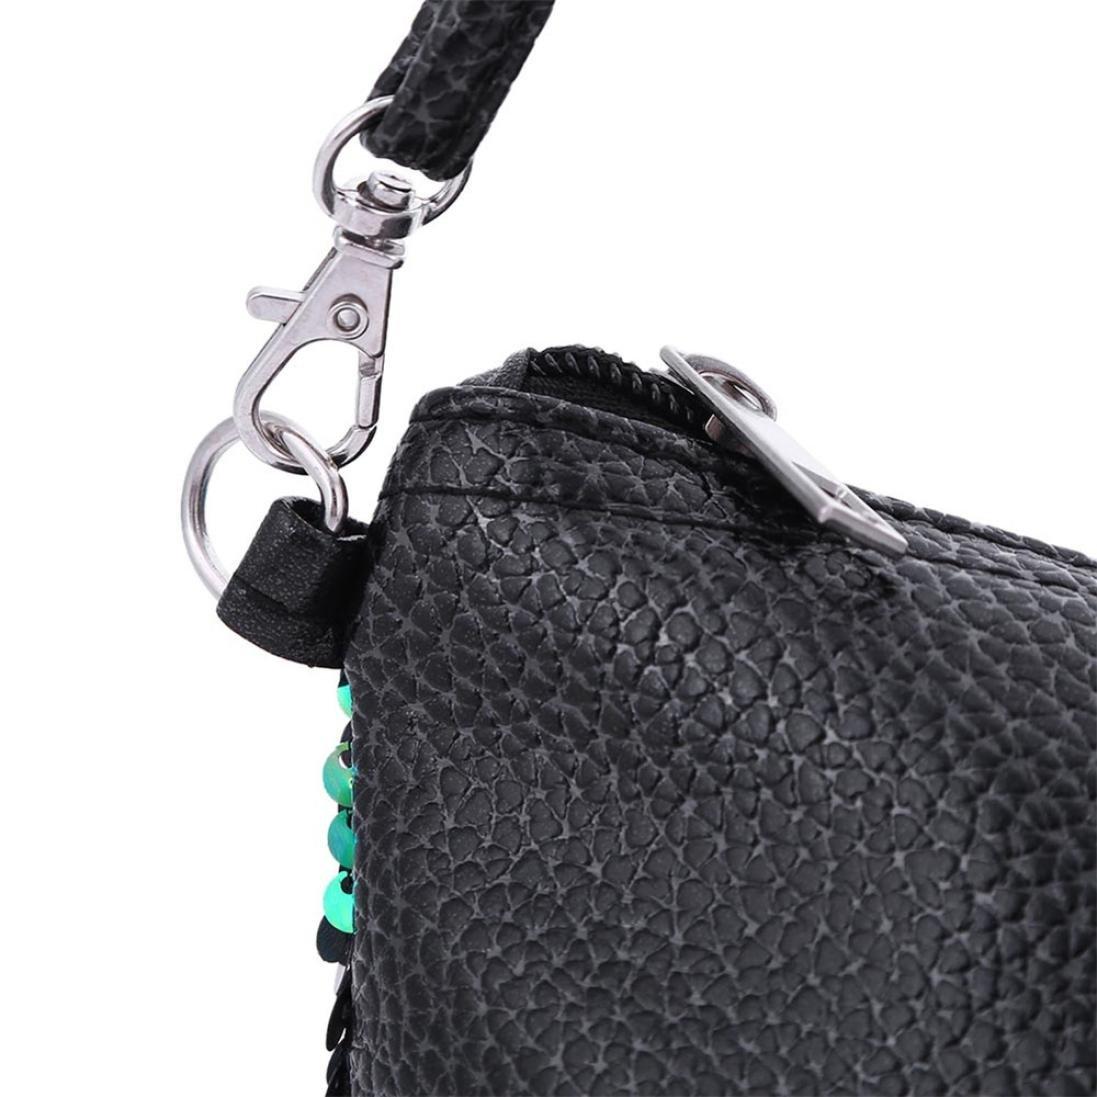 ZYooh Fashion Women Girls Handbag Sequins Tote Purse Messenger Phone Holder Bag Crossbody Shoulder Bags (Green) by iLH_ Crossbody Bag (Image #6)